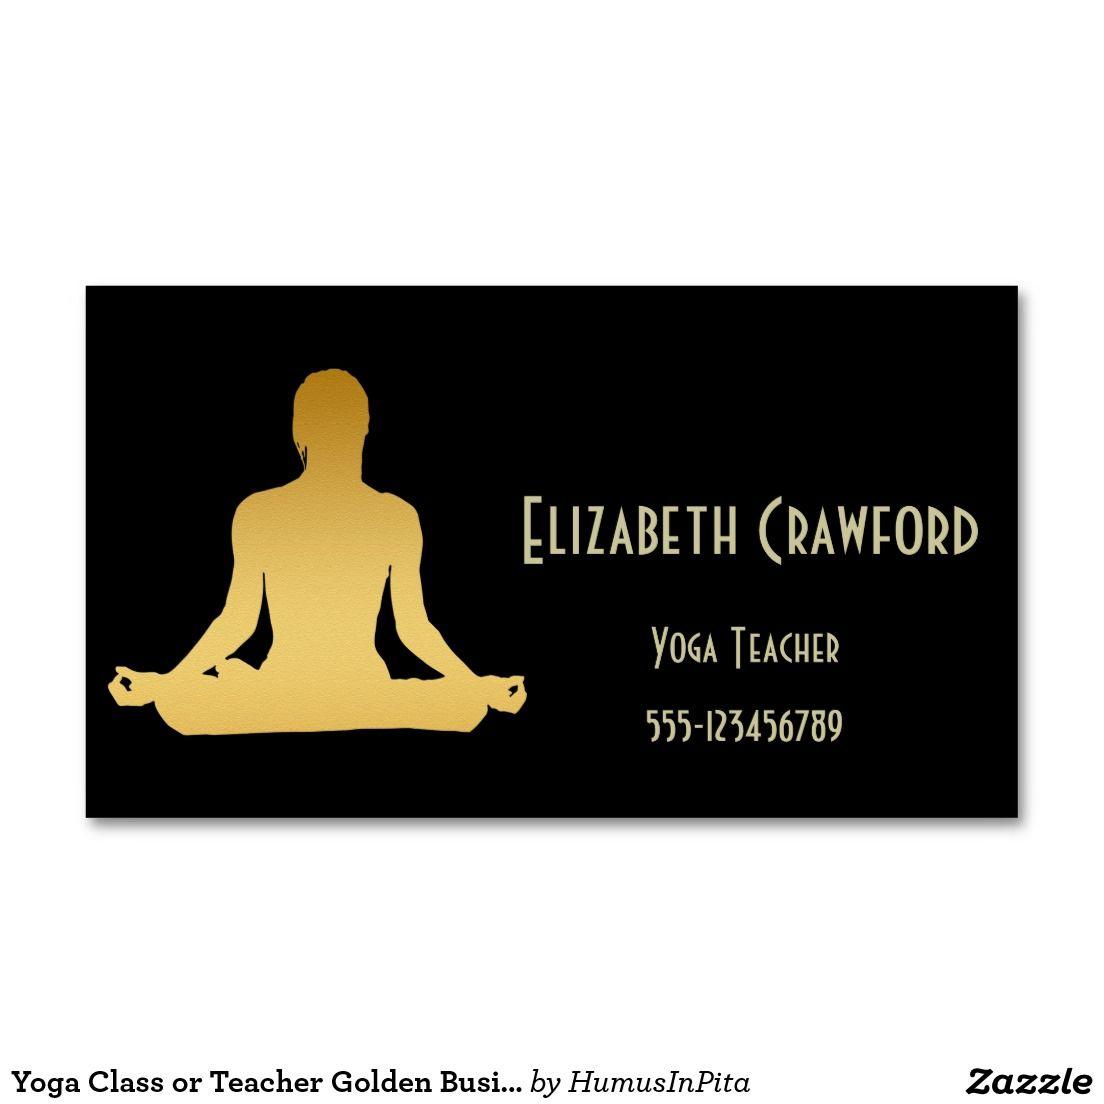 Yoga Class or Teacher Golden Business Card | Business cards and Business